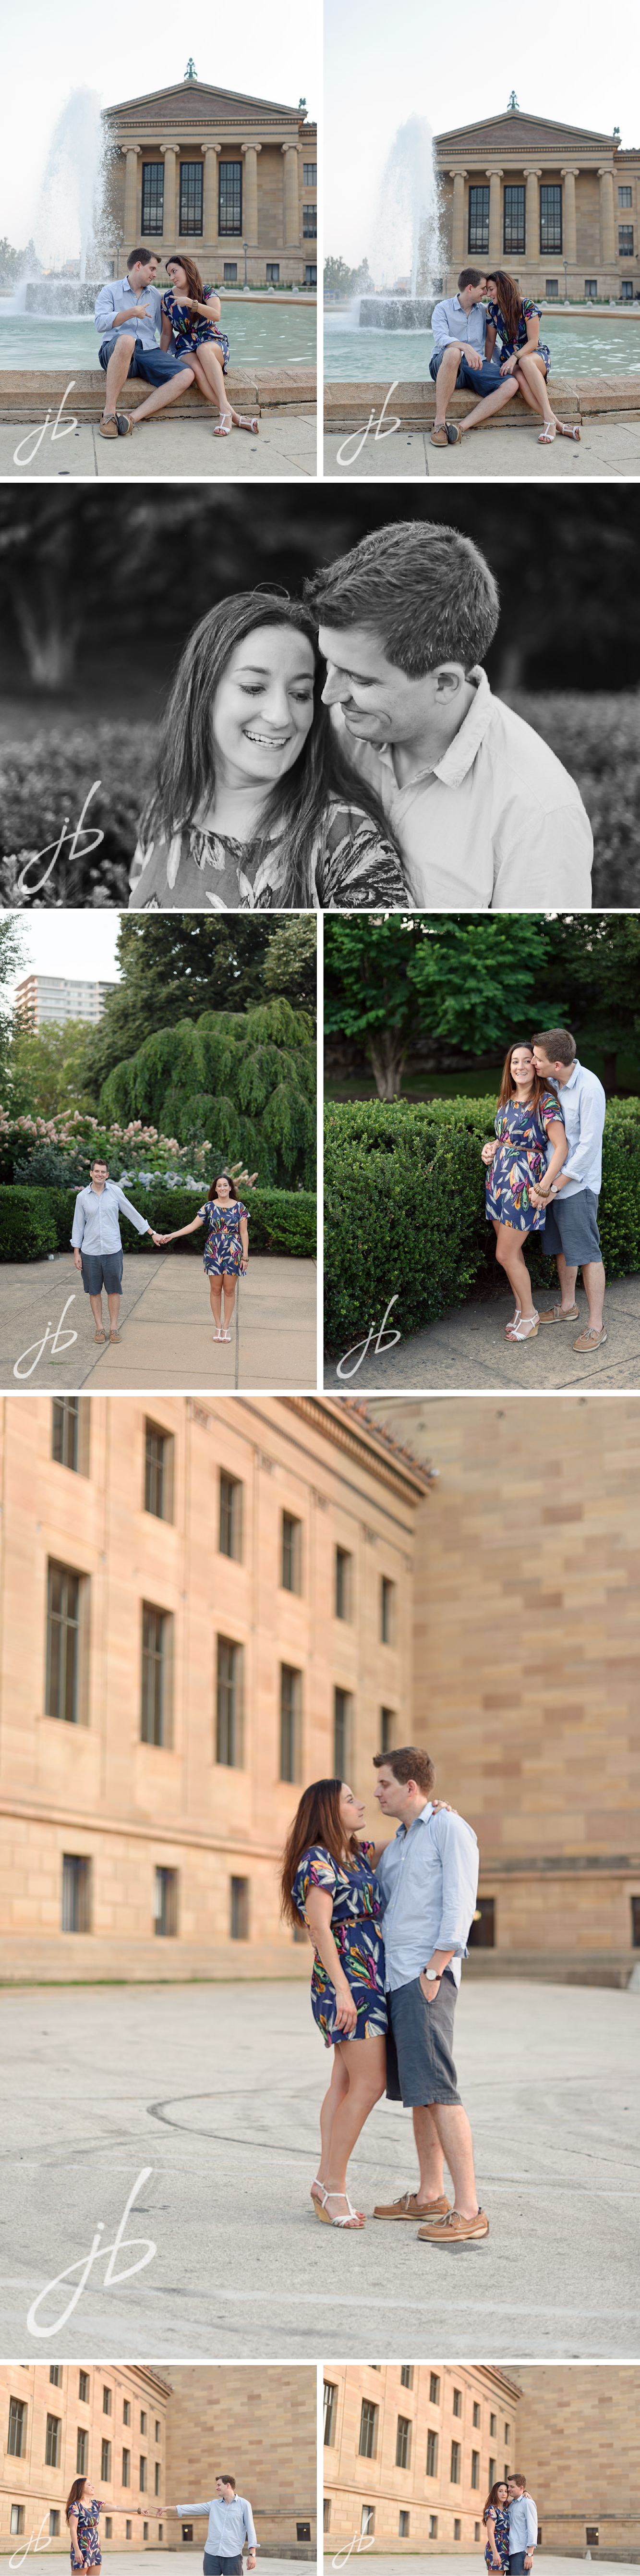 Fairmount Park Philadelphia wedding photography by Jeremy Bischoff Photography